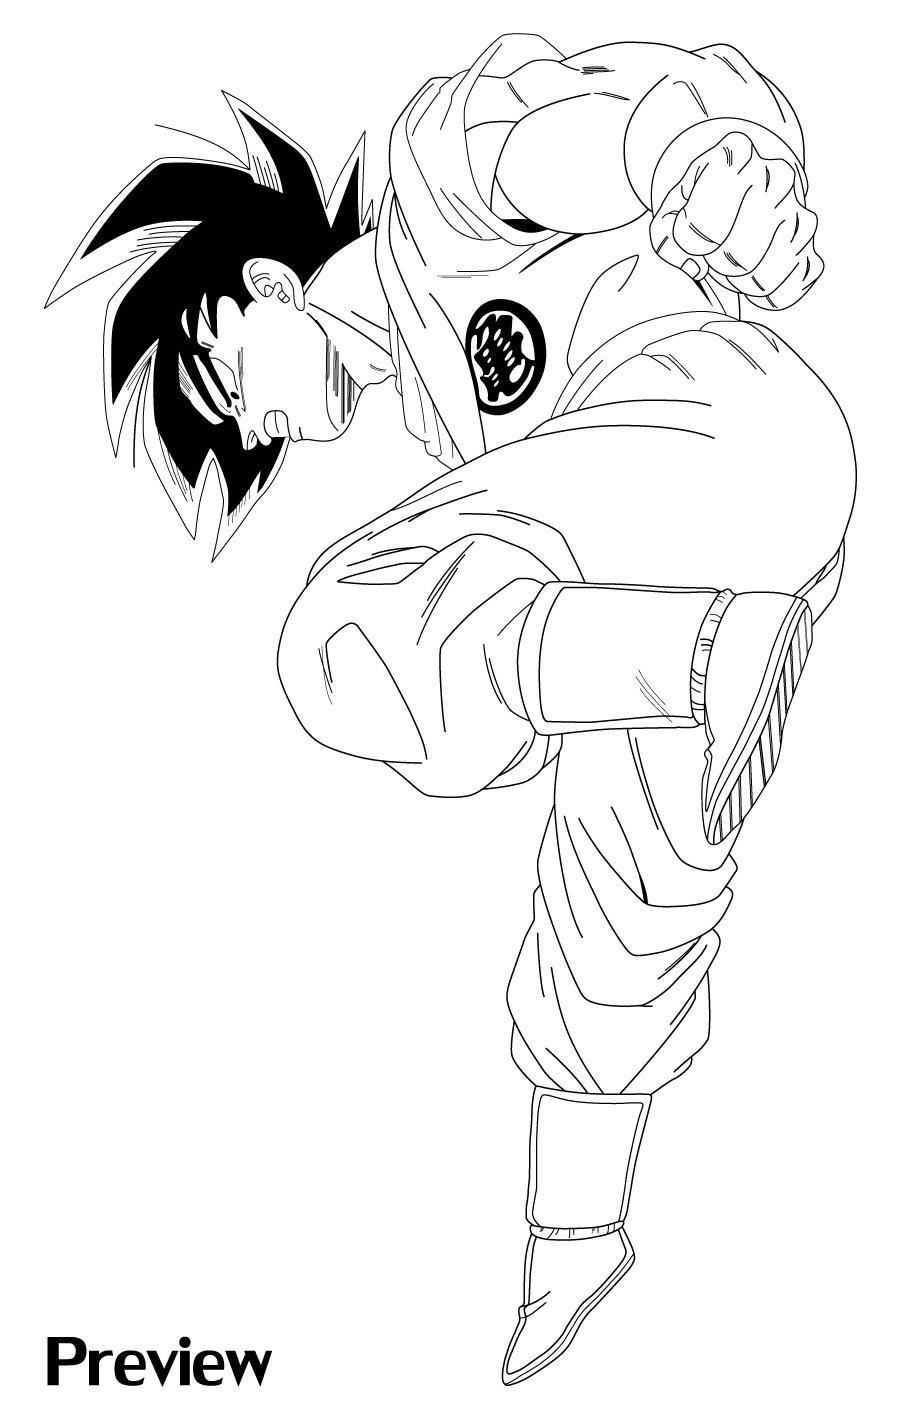 Goku Kaioken - Preview by TK-Master on DeviantArt